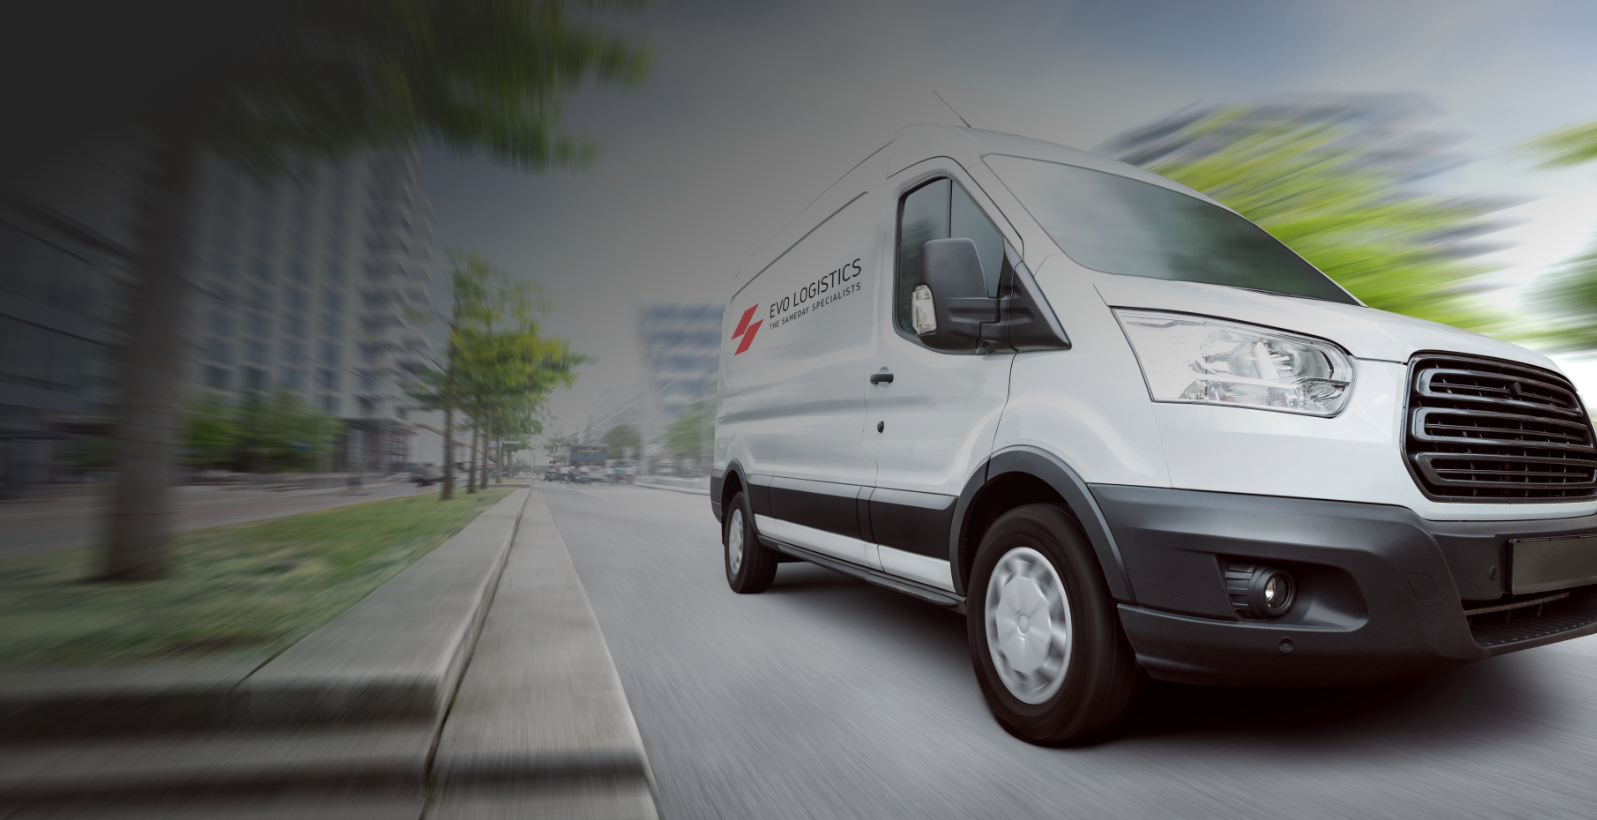 White Evo Logistics mini truck driving on the road